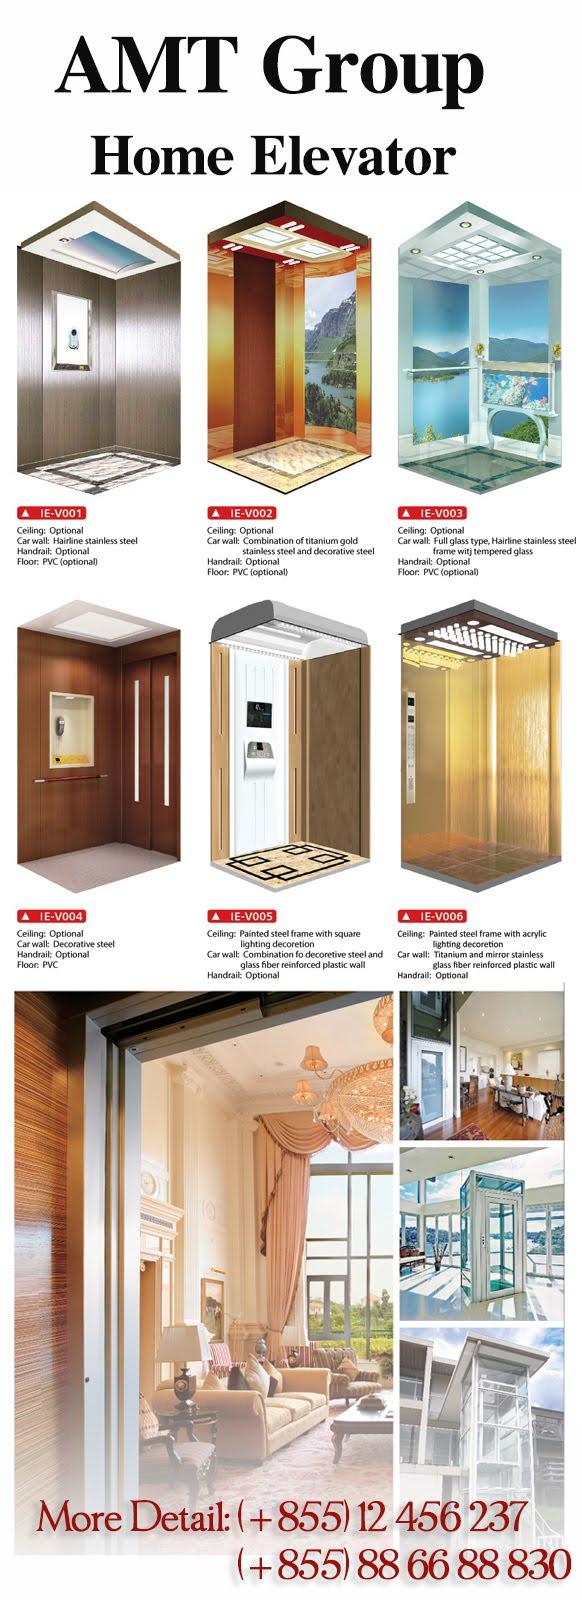 iCON Home Elevator